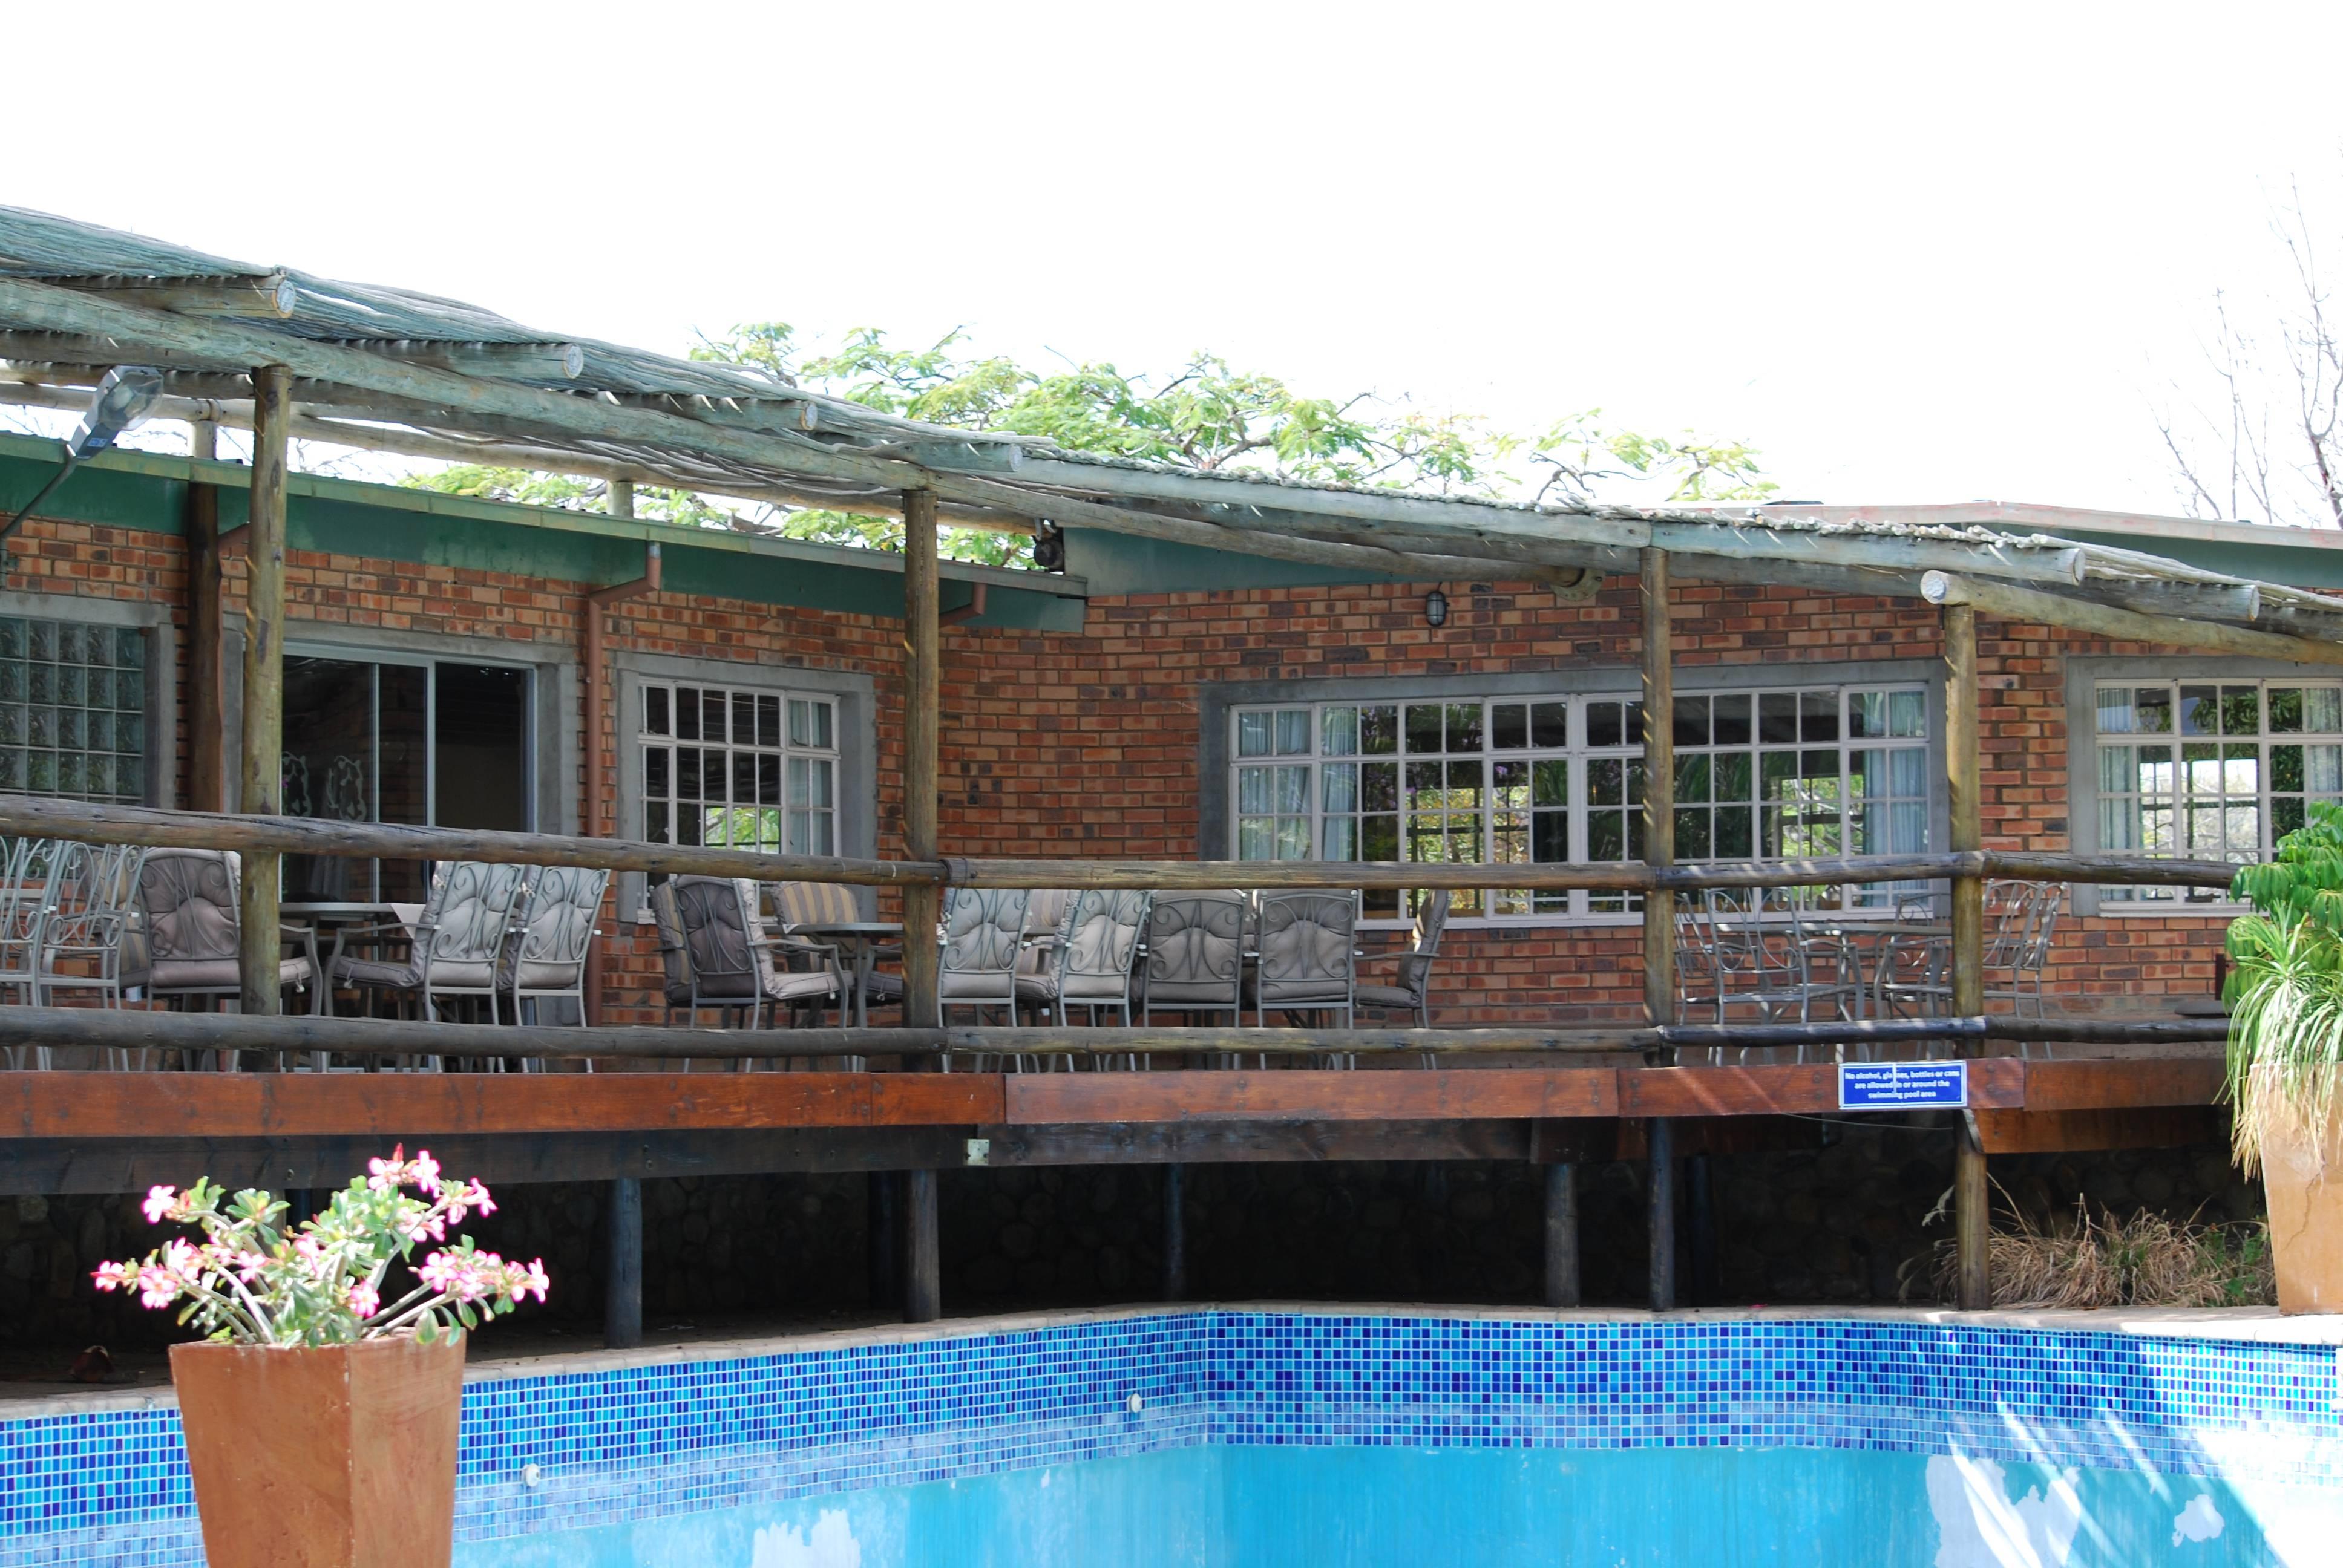 Photo 2: The hippo pool resort, une petit coin de paradis !